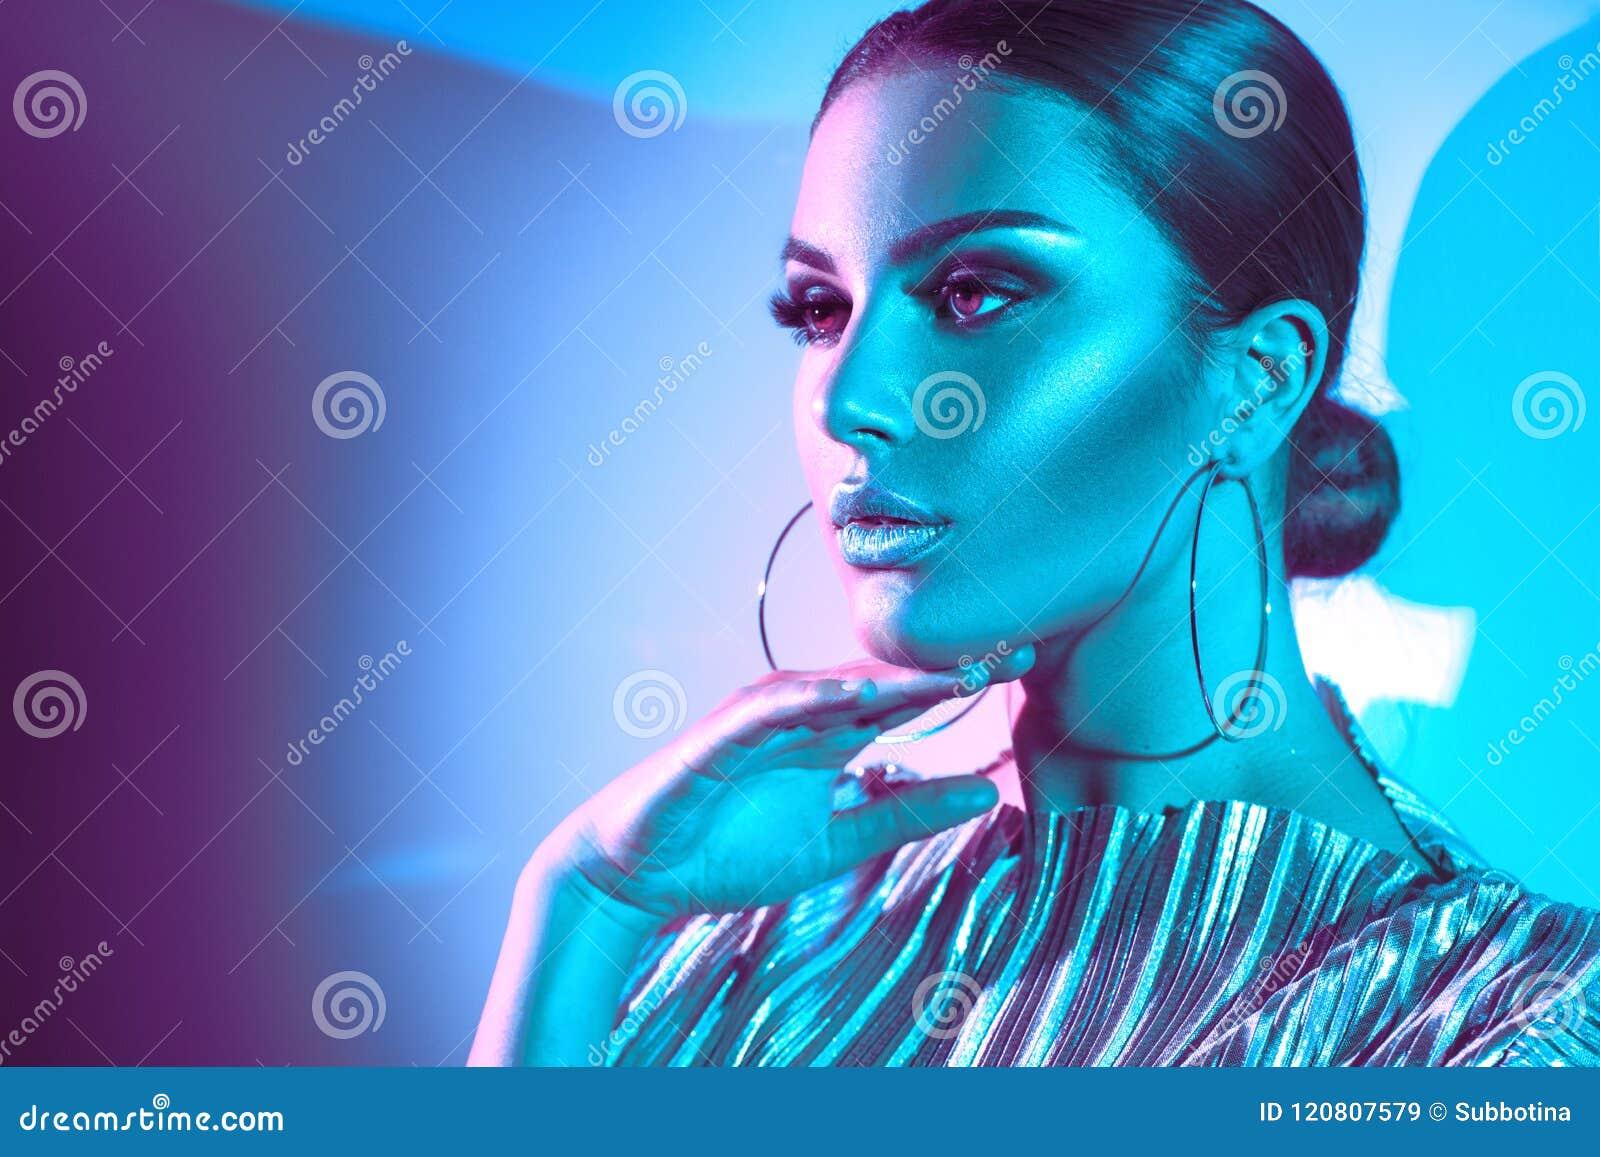 Fashion model brunette woman in colorful bright neon lights. Beautiful girl, trendy glowing makeup, metallic silver lips